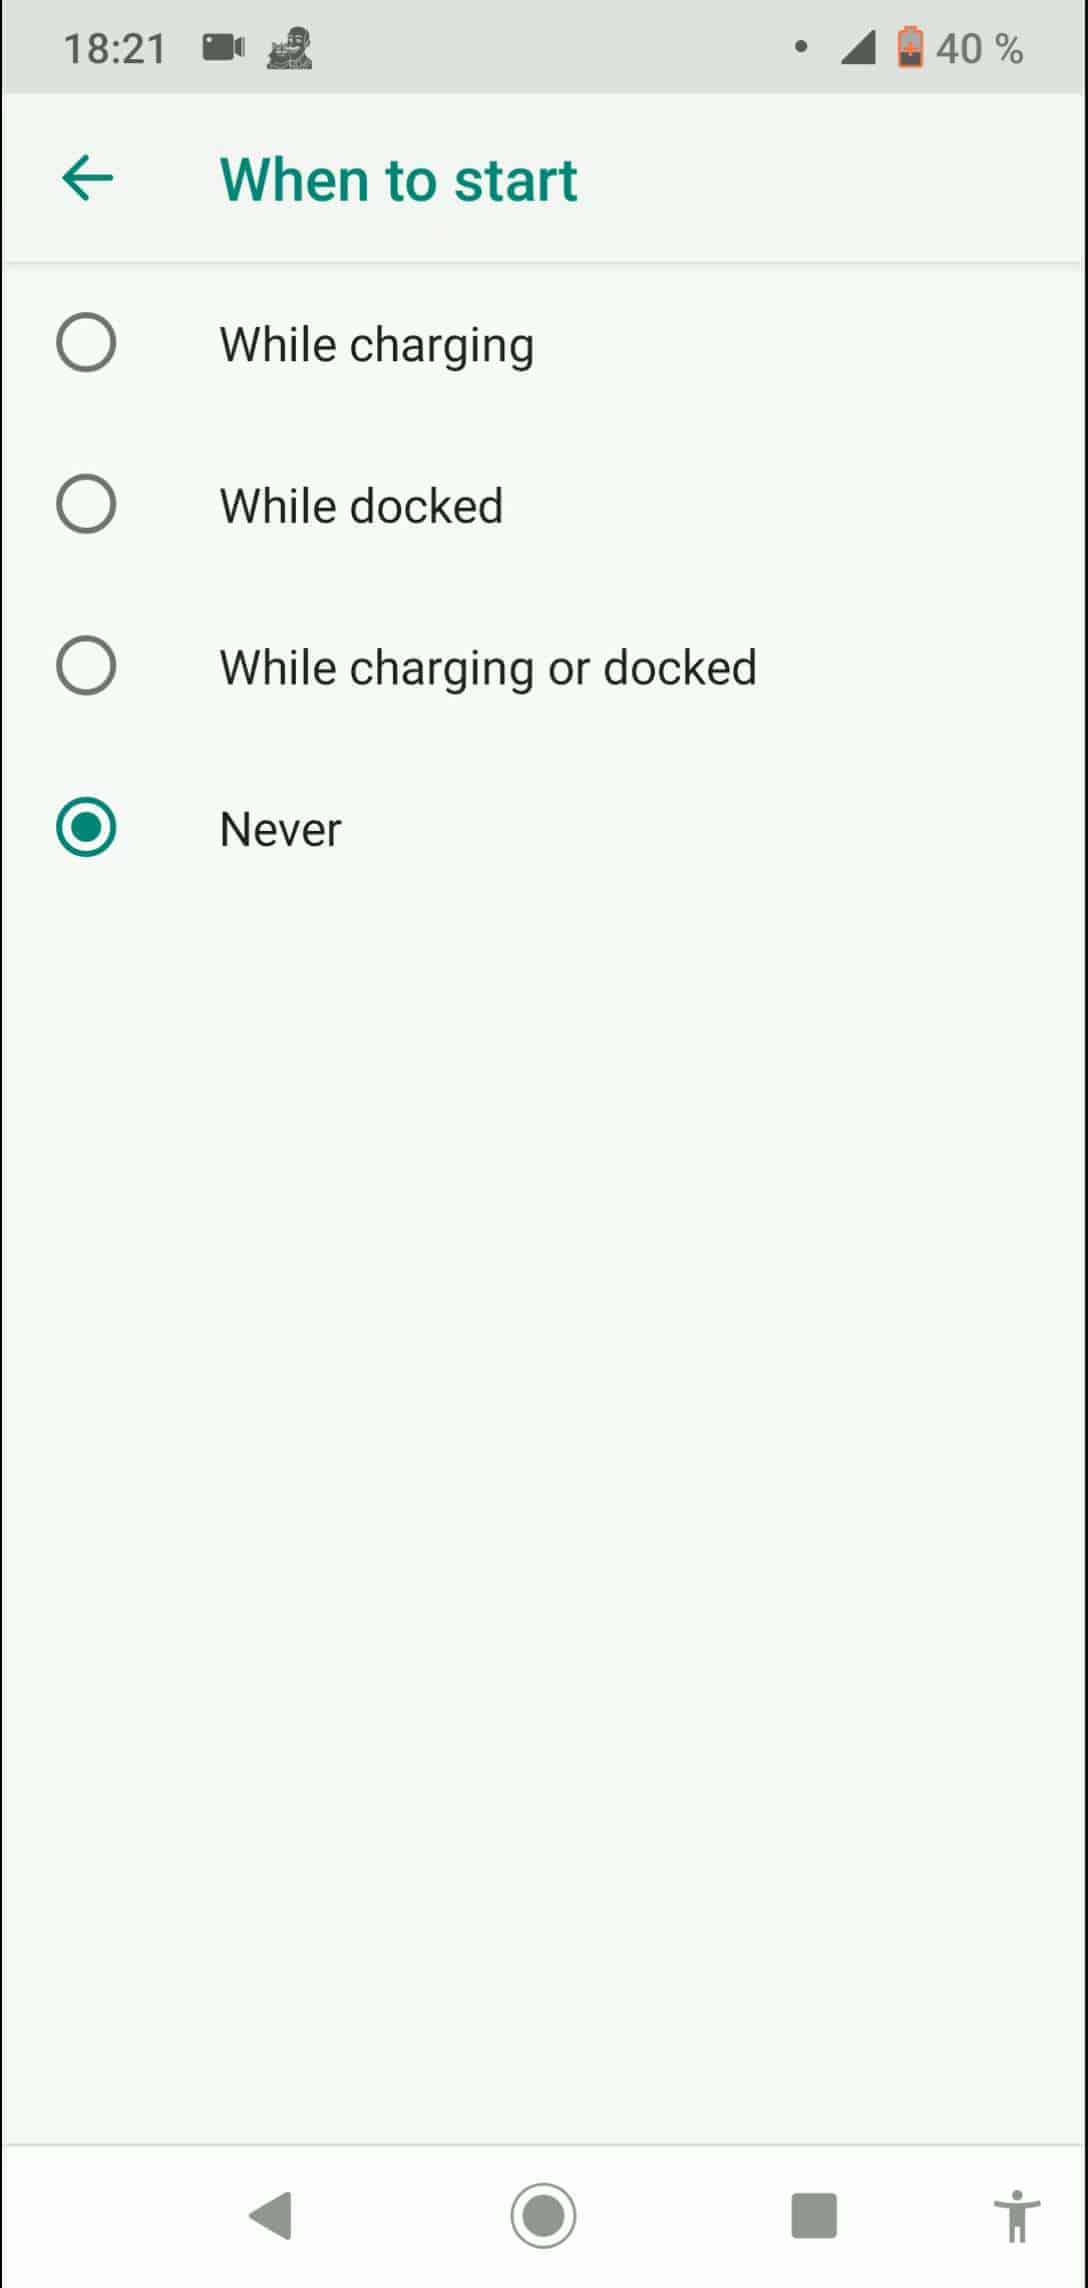 Step 6: Choose an option